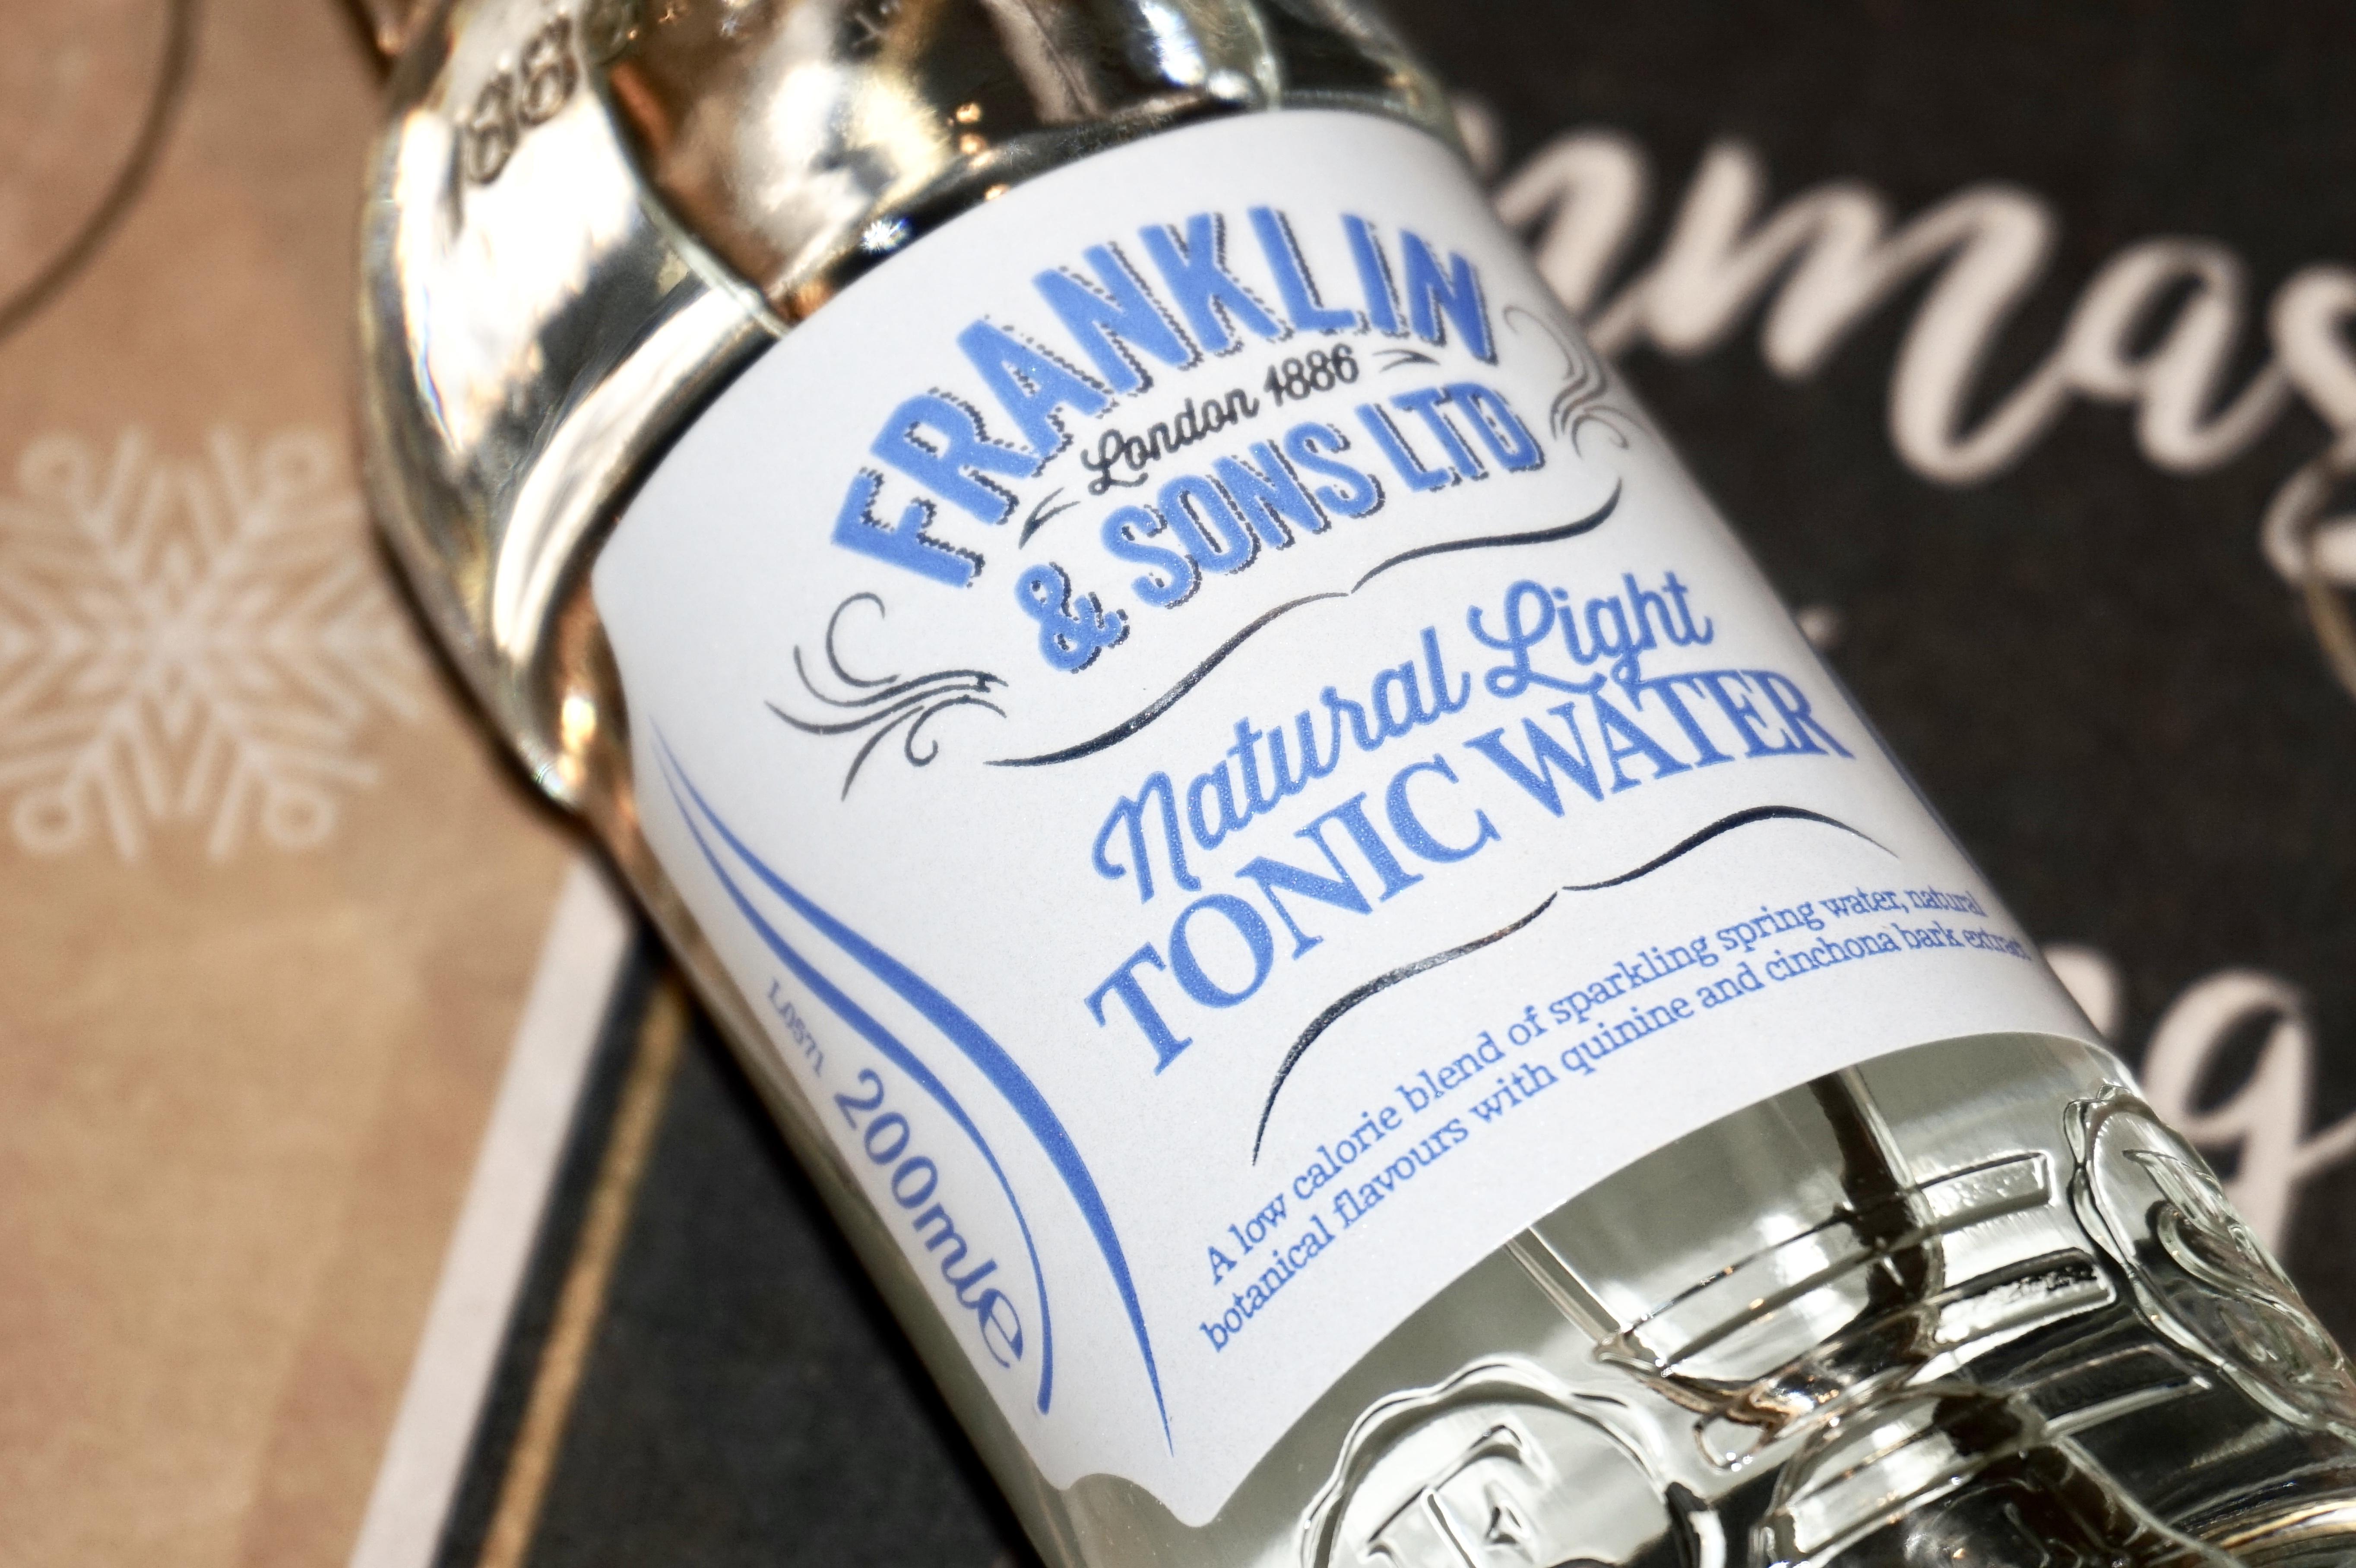 gin advent calendar Franklin